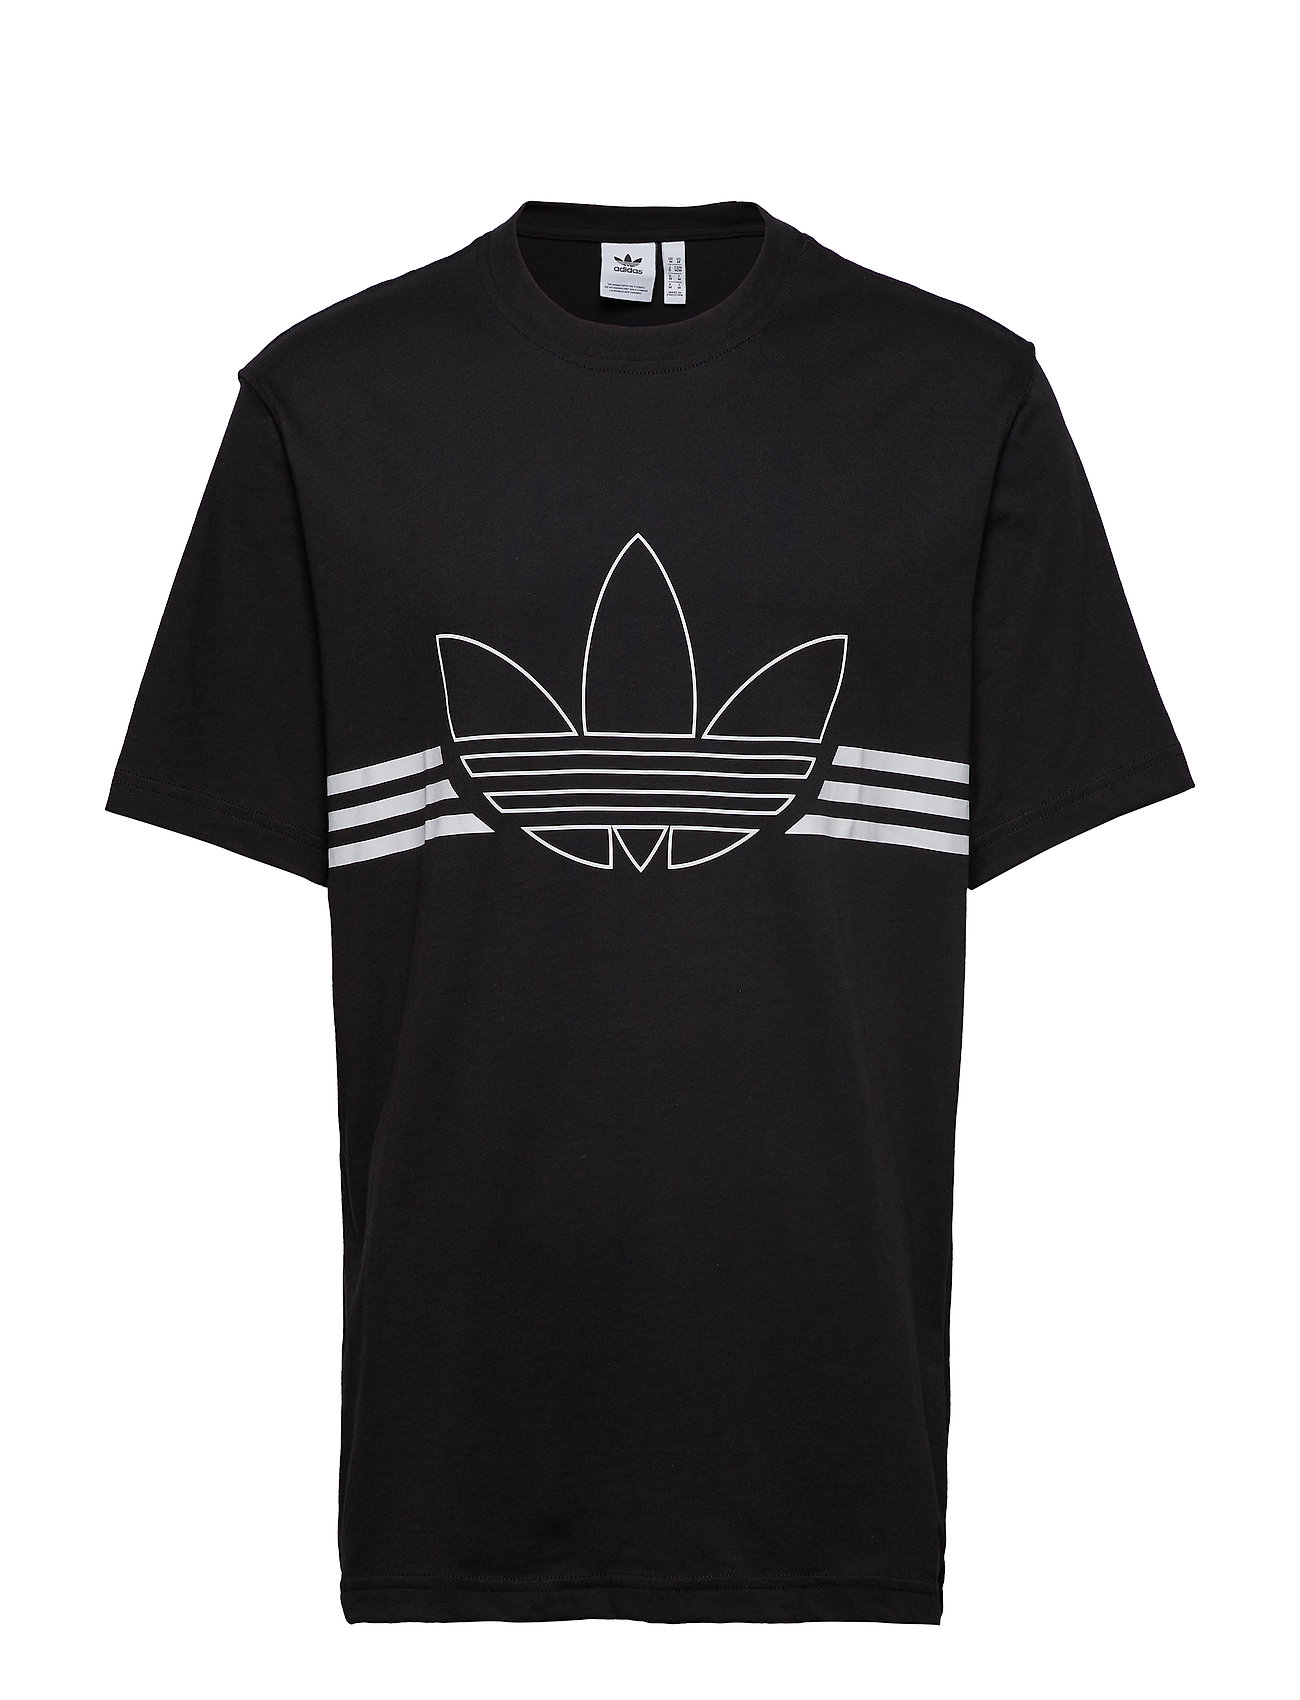 adidas Originals OUTLINE TRF TEE - BLACK